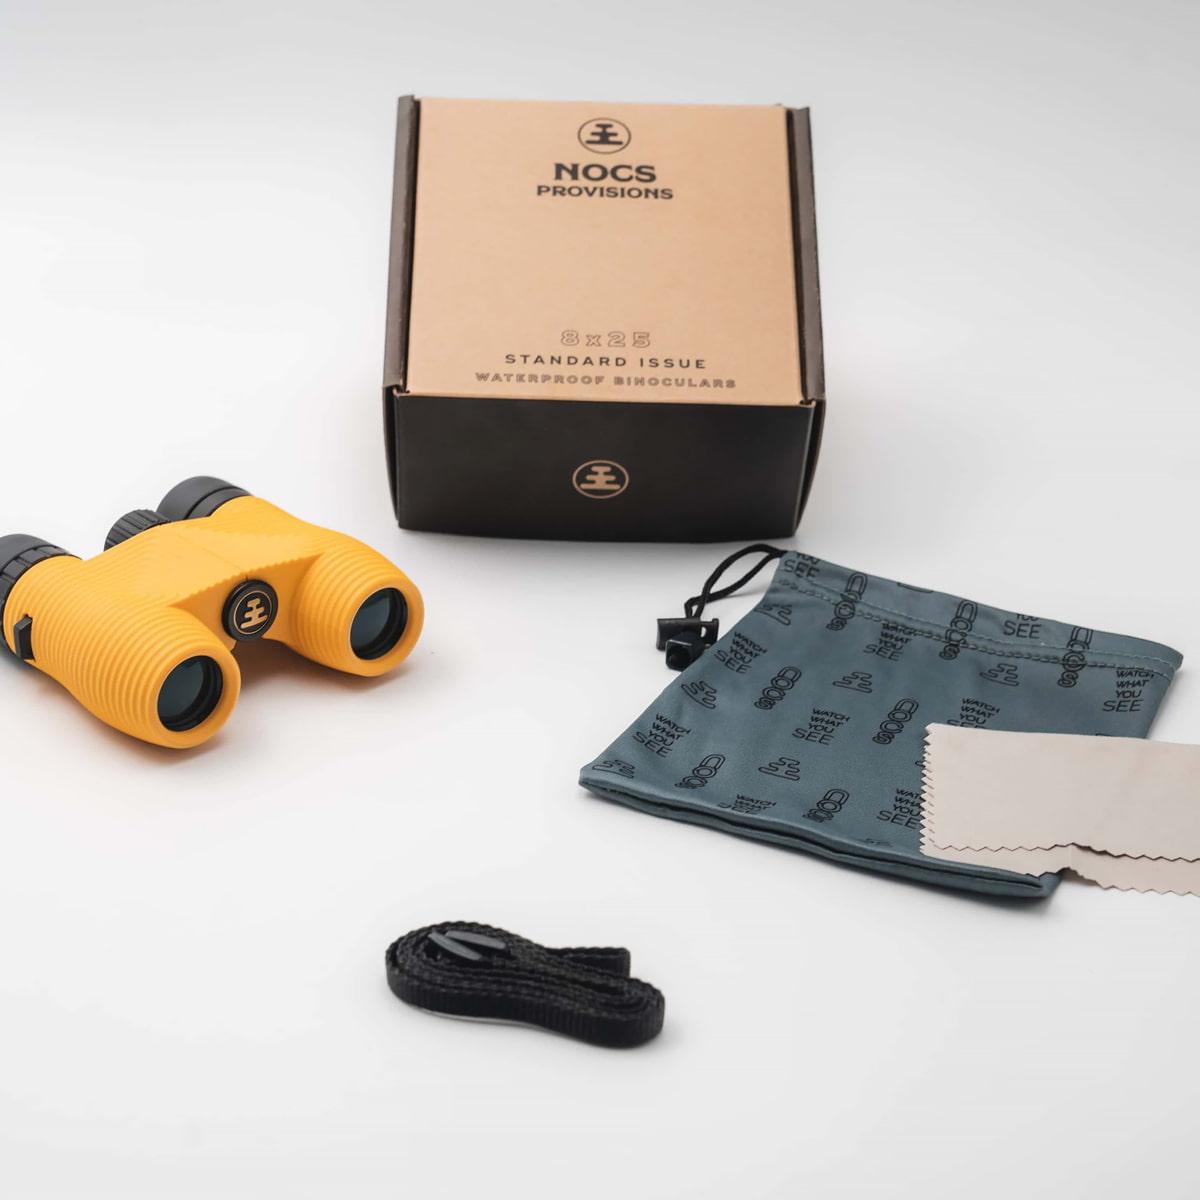 Weatherproof Binocular